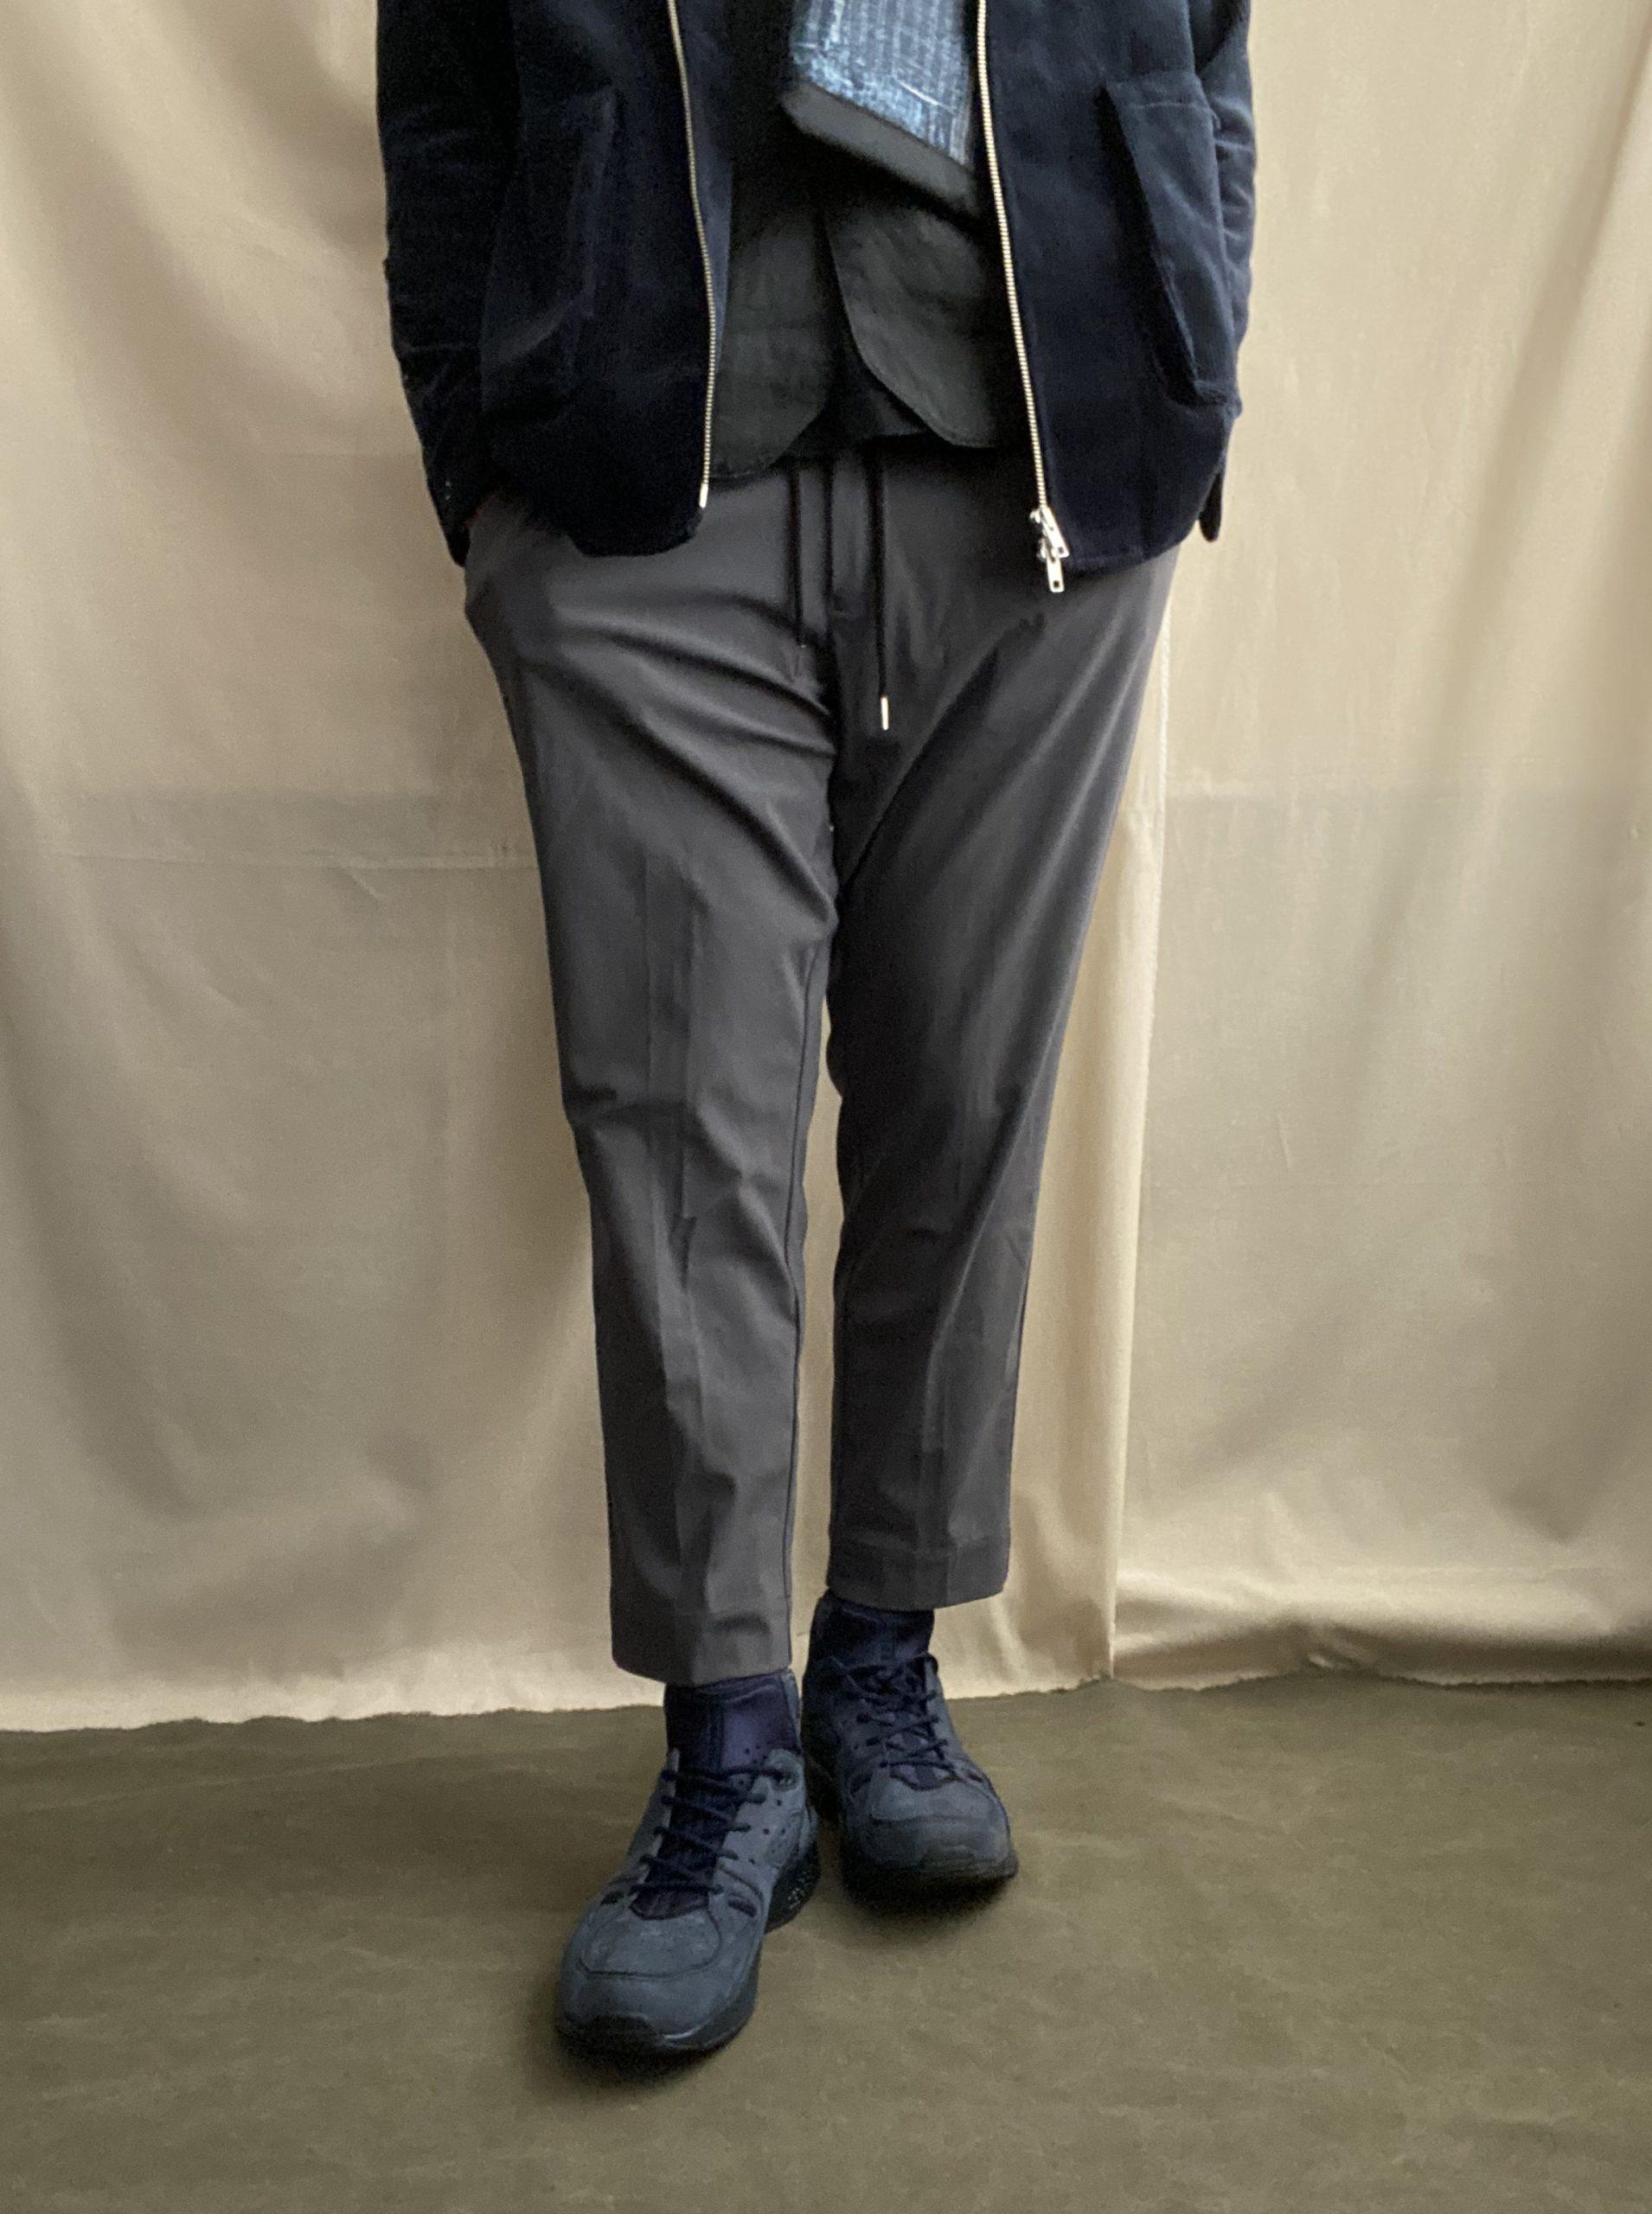 【BLOG】TOMCAT RELAX PANTS!!